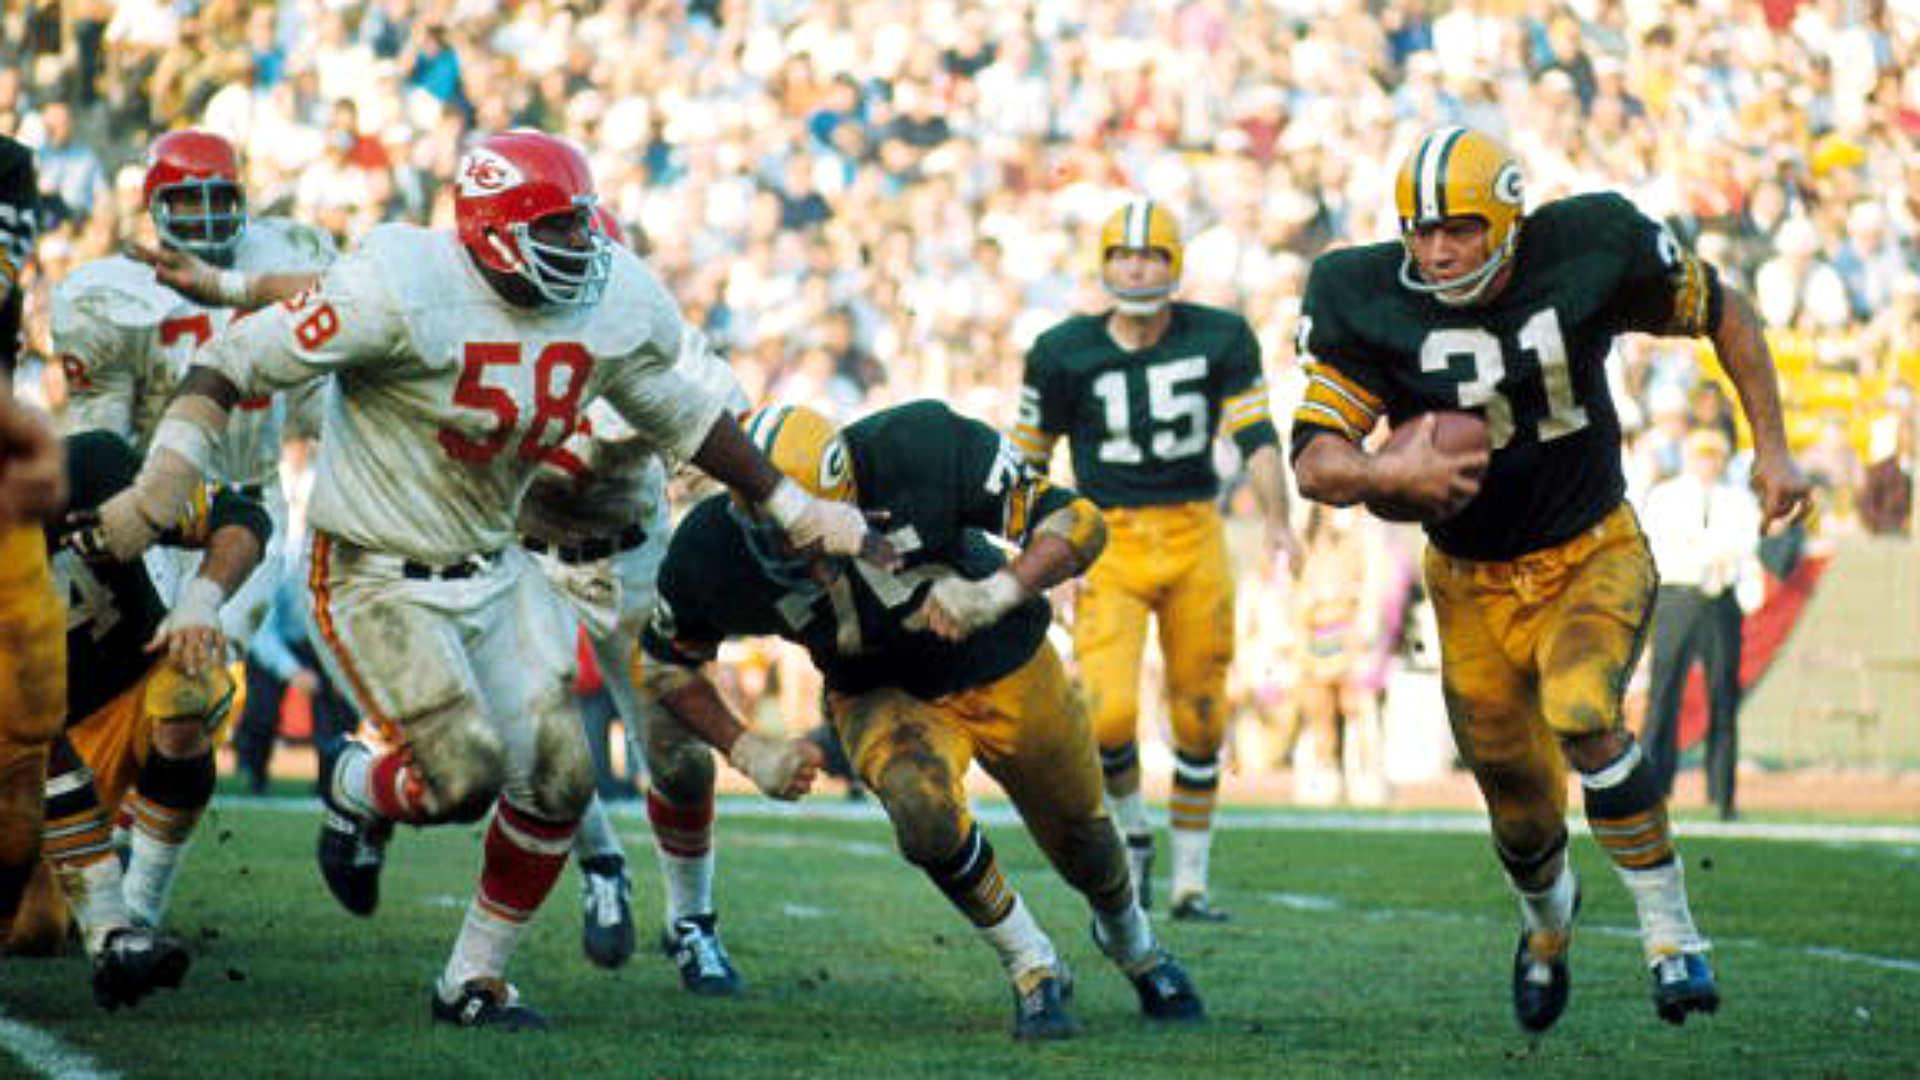 SuperBowlI-Chiefs-Packers-011216-USNews-Getty-FTR